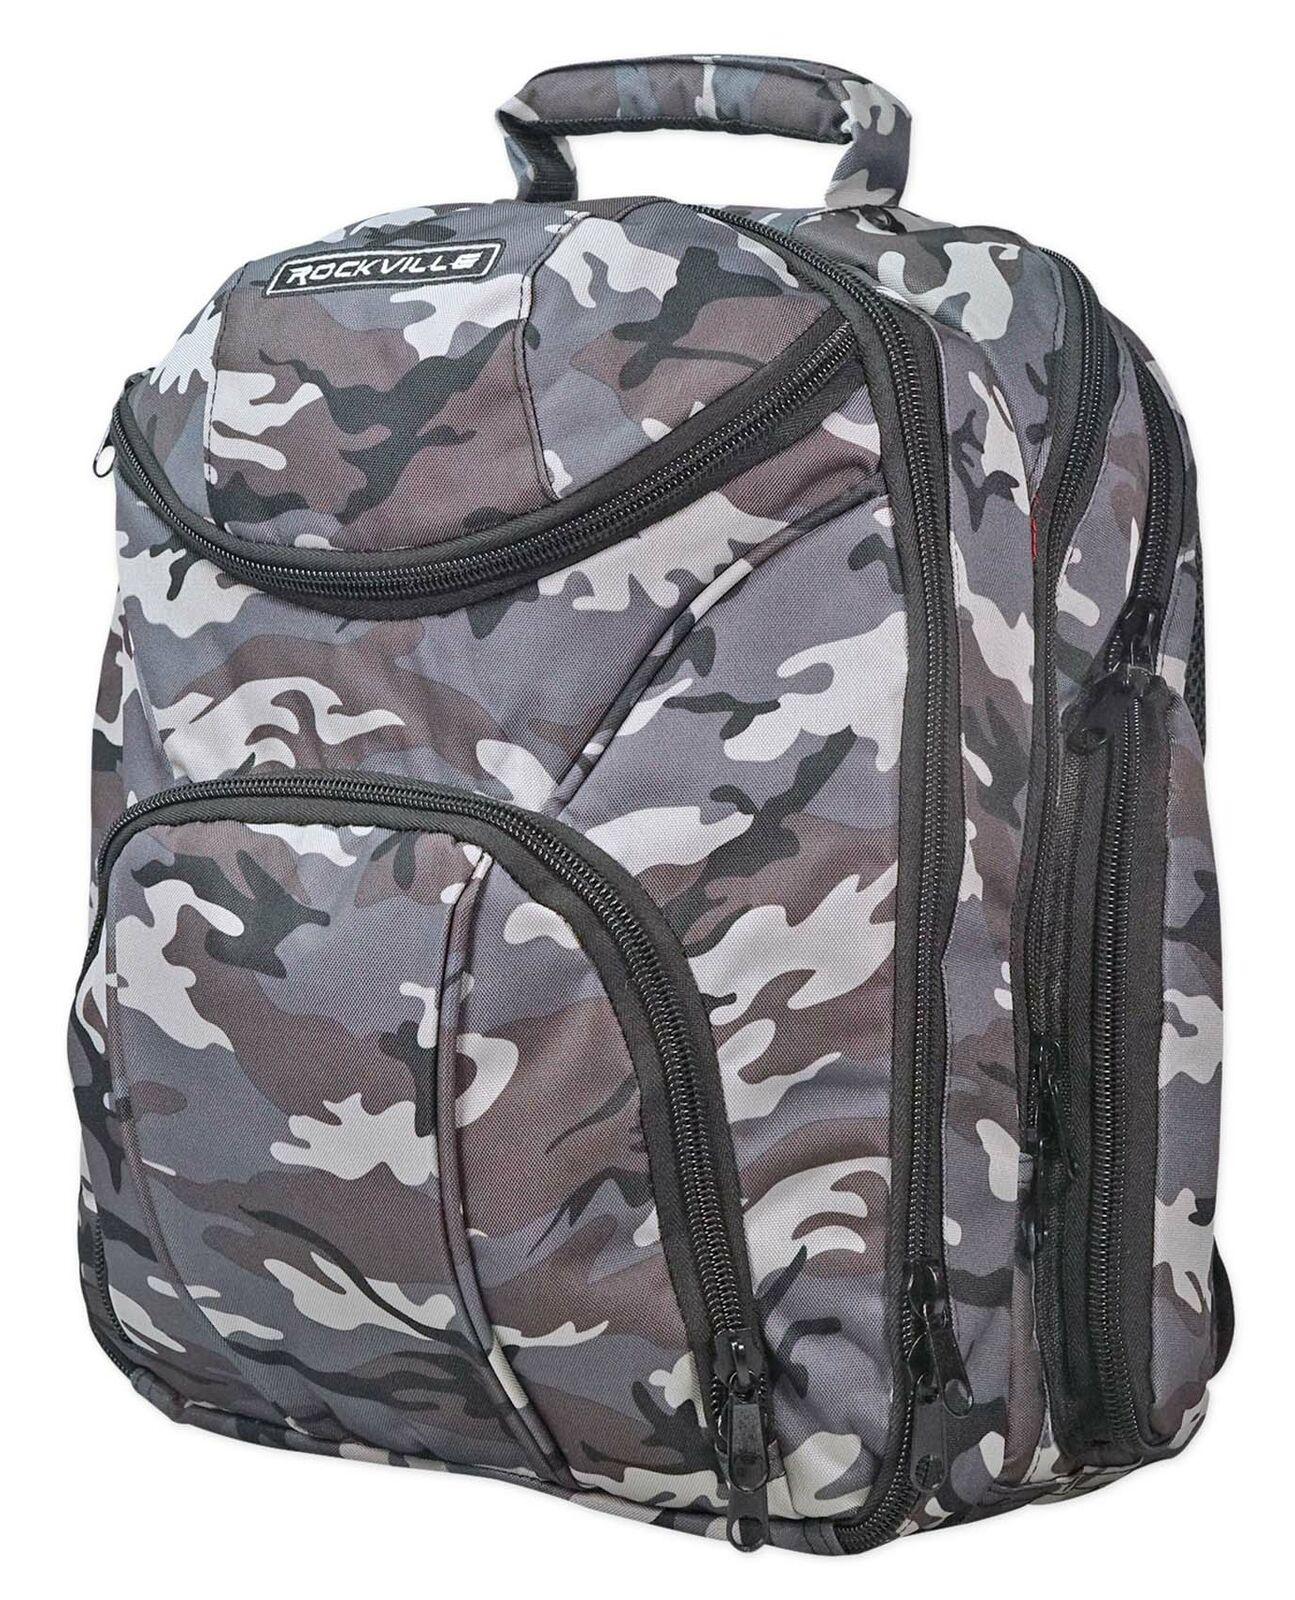 Rockville Travel Case Camo Backpack Bag For Allen & Heath ZED60-14FX Mixer